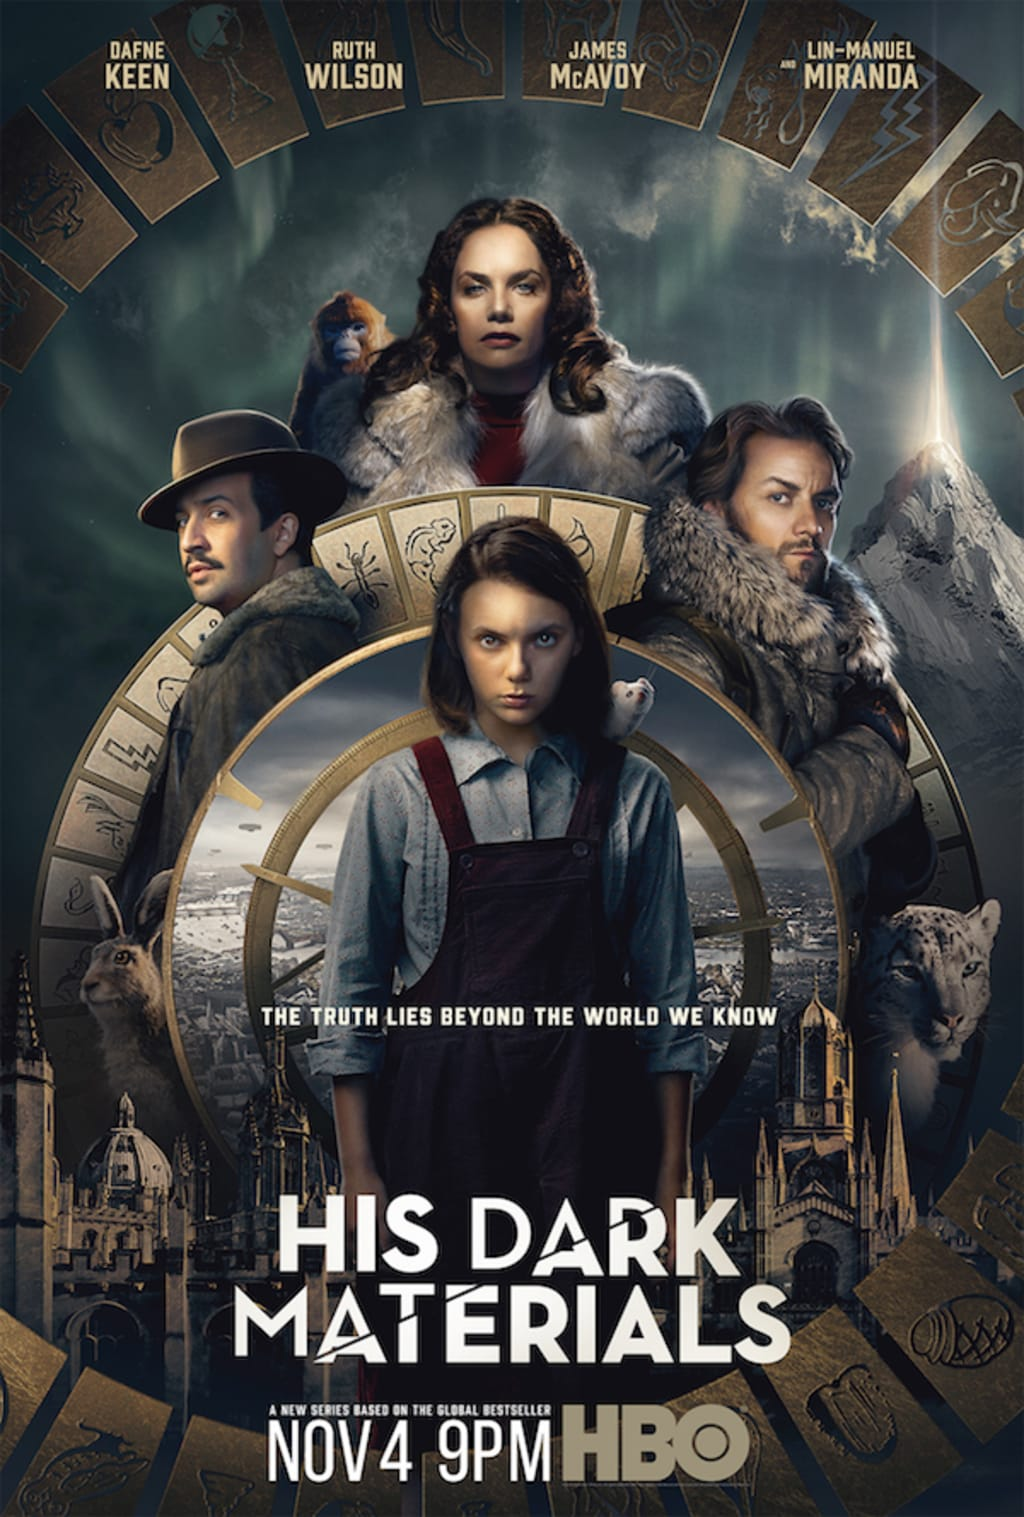 Review of 'His Dark Materials' 1.1